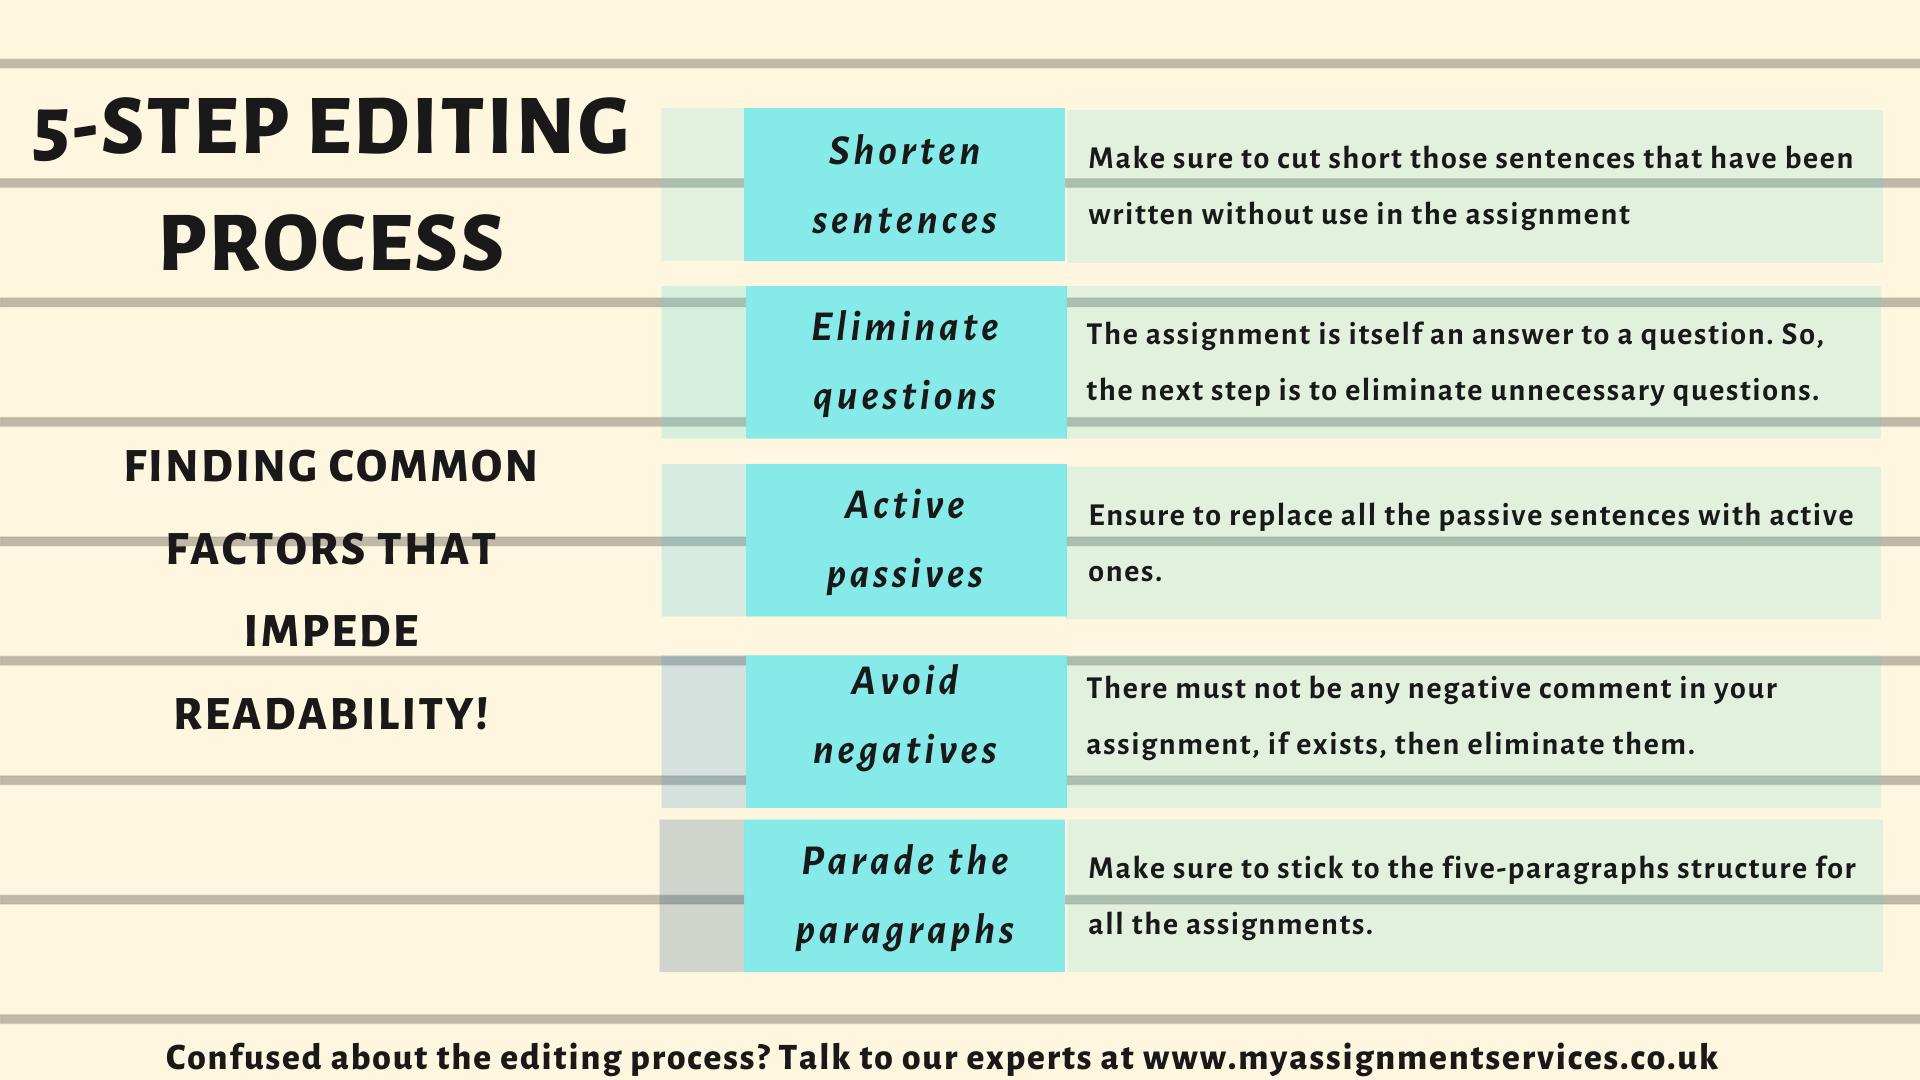 5-step editing process